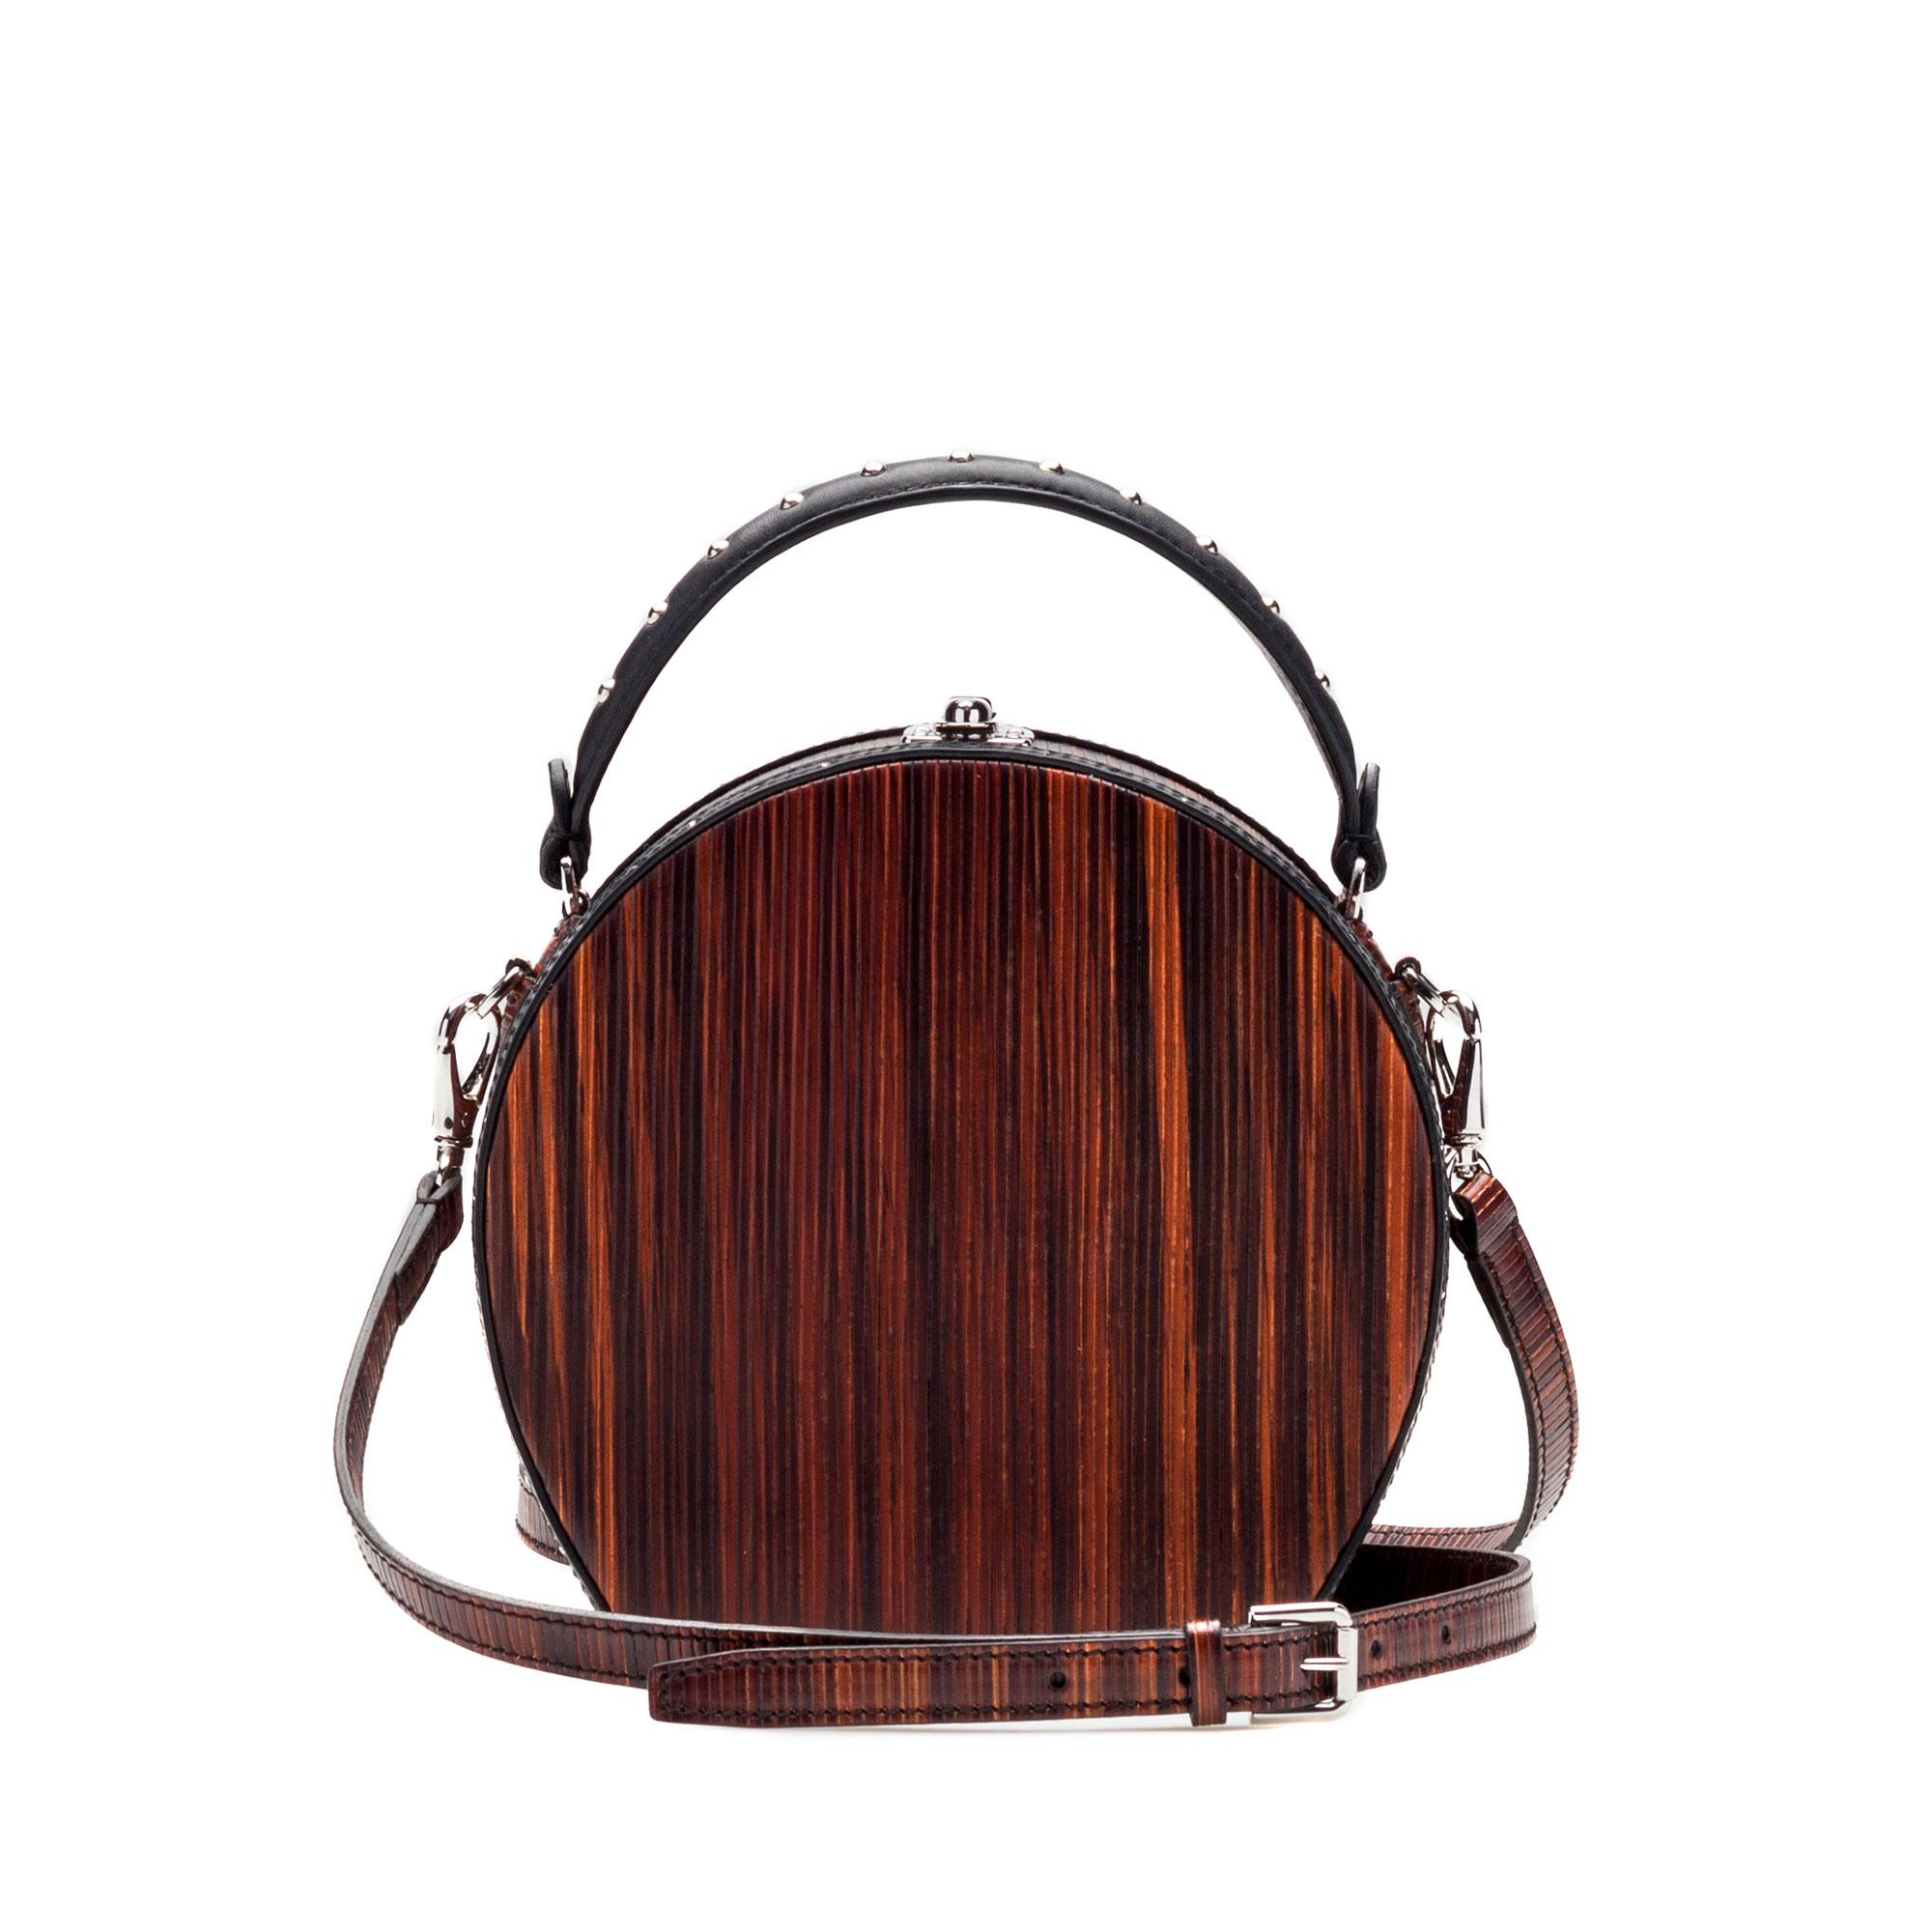 The wood effect french calf and wood leather Regular Bertoncina bag by Bertoni 1949 03